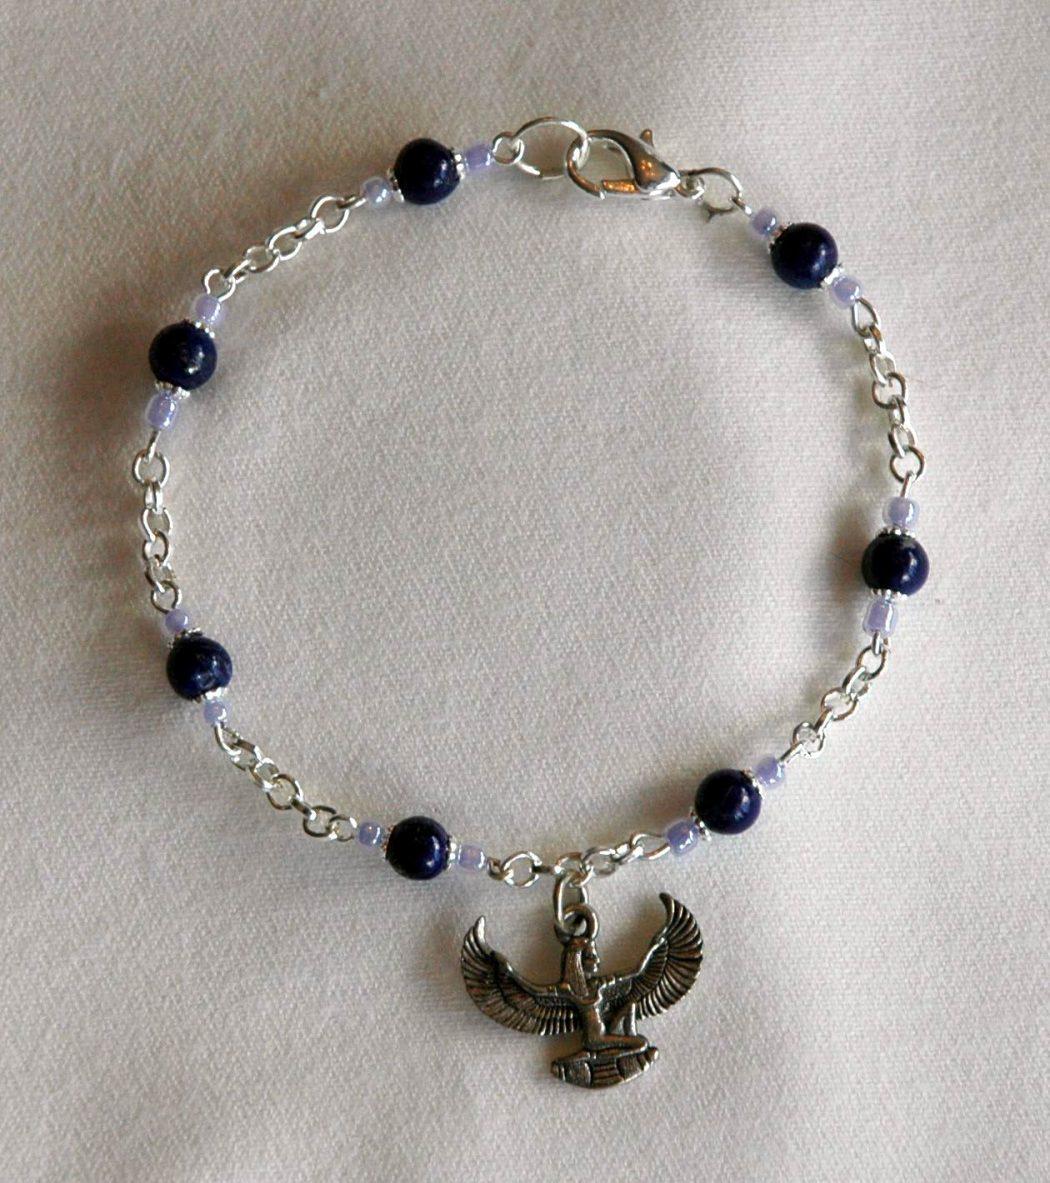 isisDSC 35 Goddess Jewelries for Those Who Like History